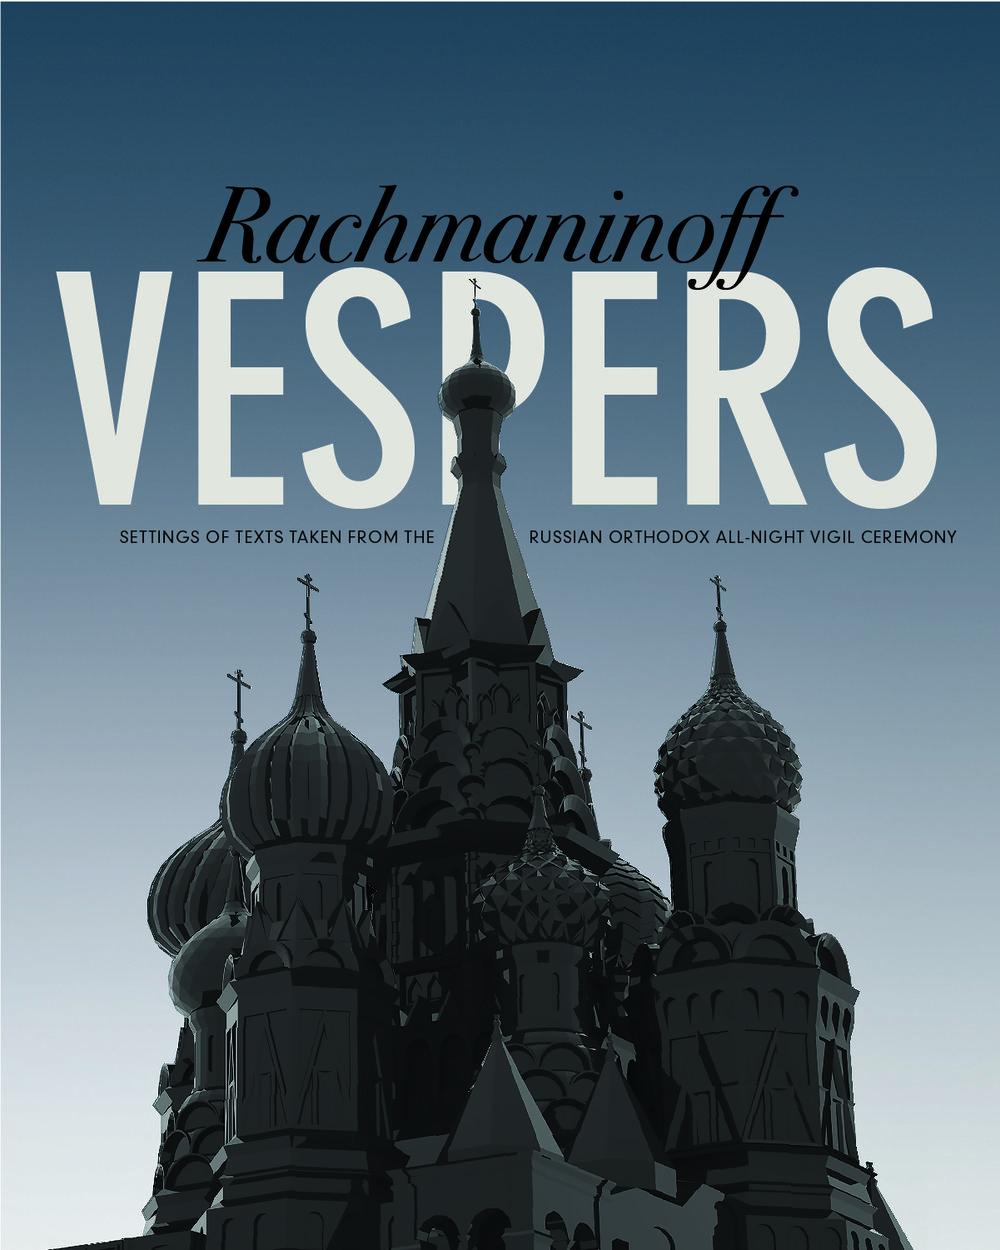 Rachmaninoff_Promo_Image.jpg